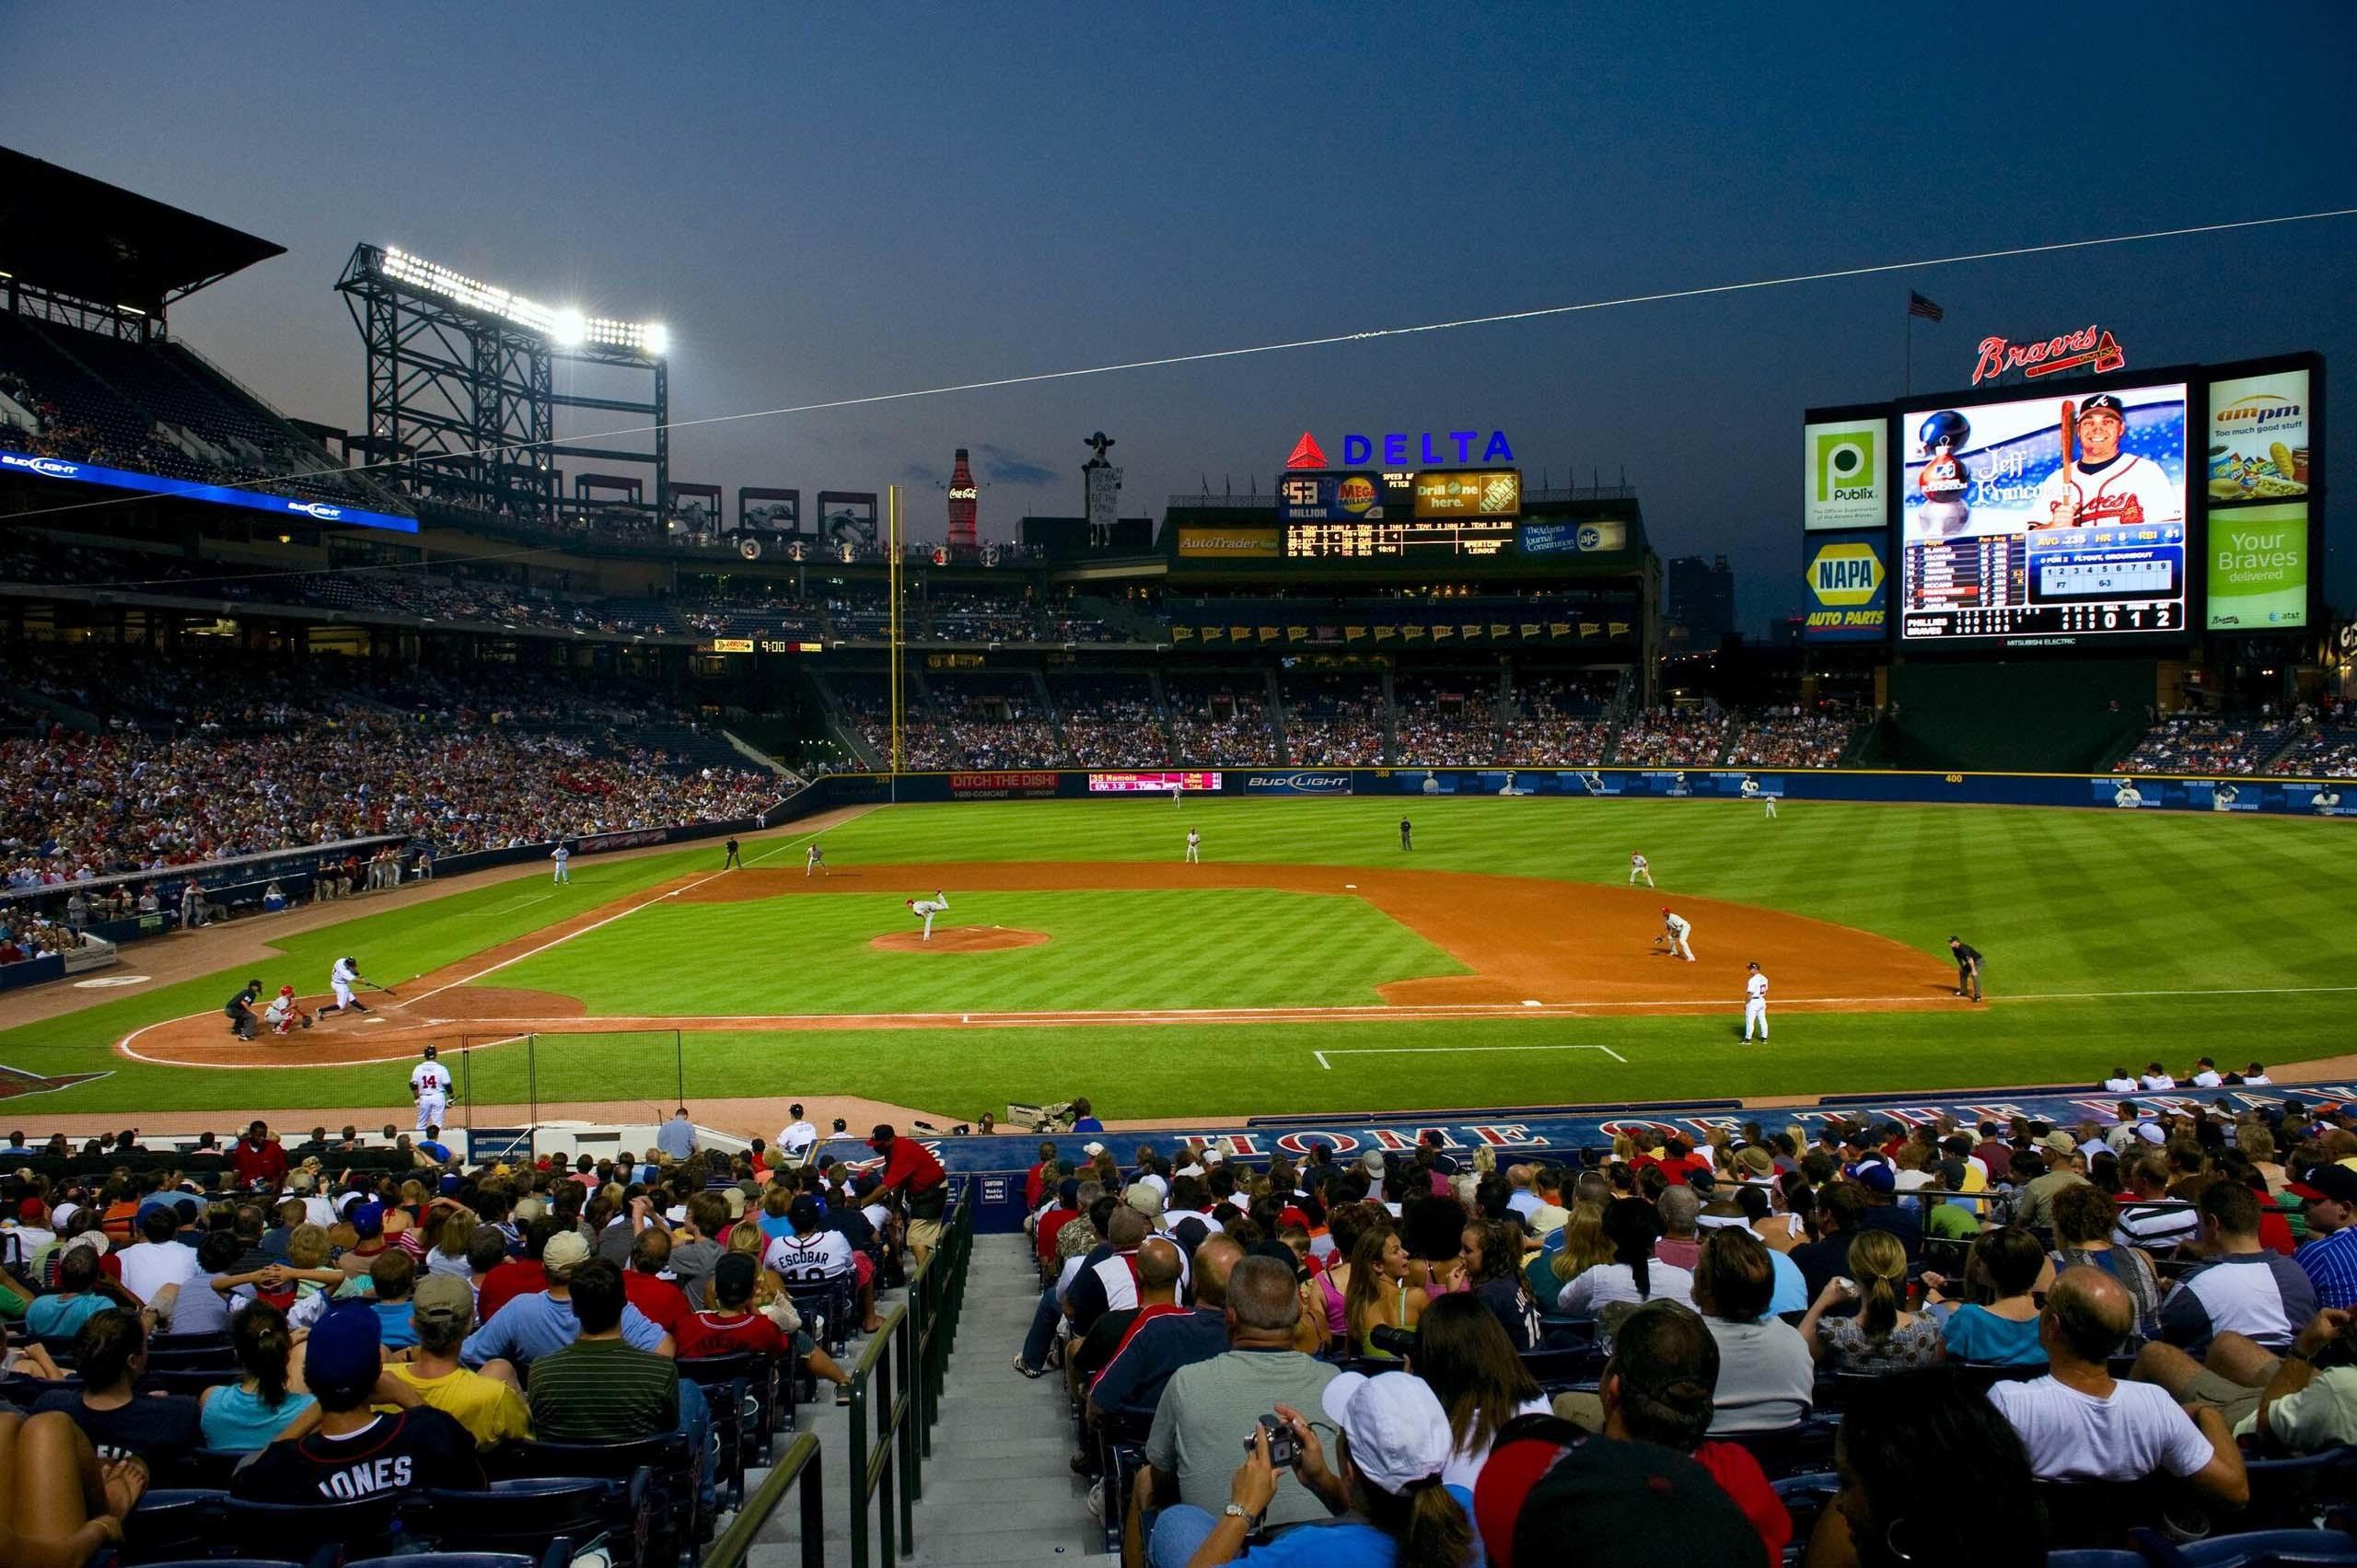 Atlanta Braves Turner Field Wallpaper HD – Daily Backgrounds in HD